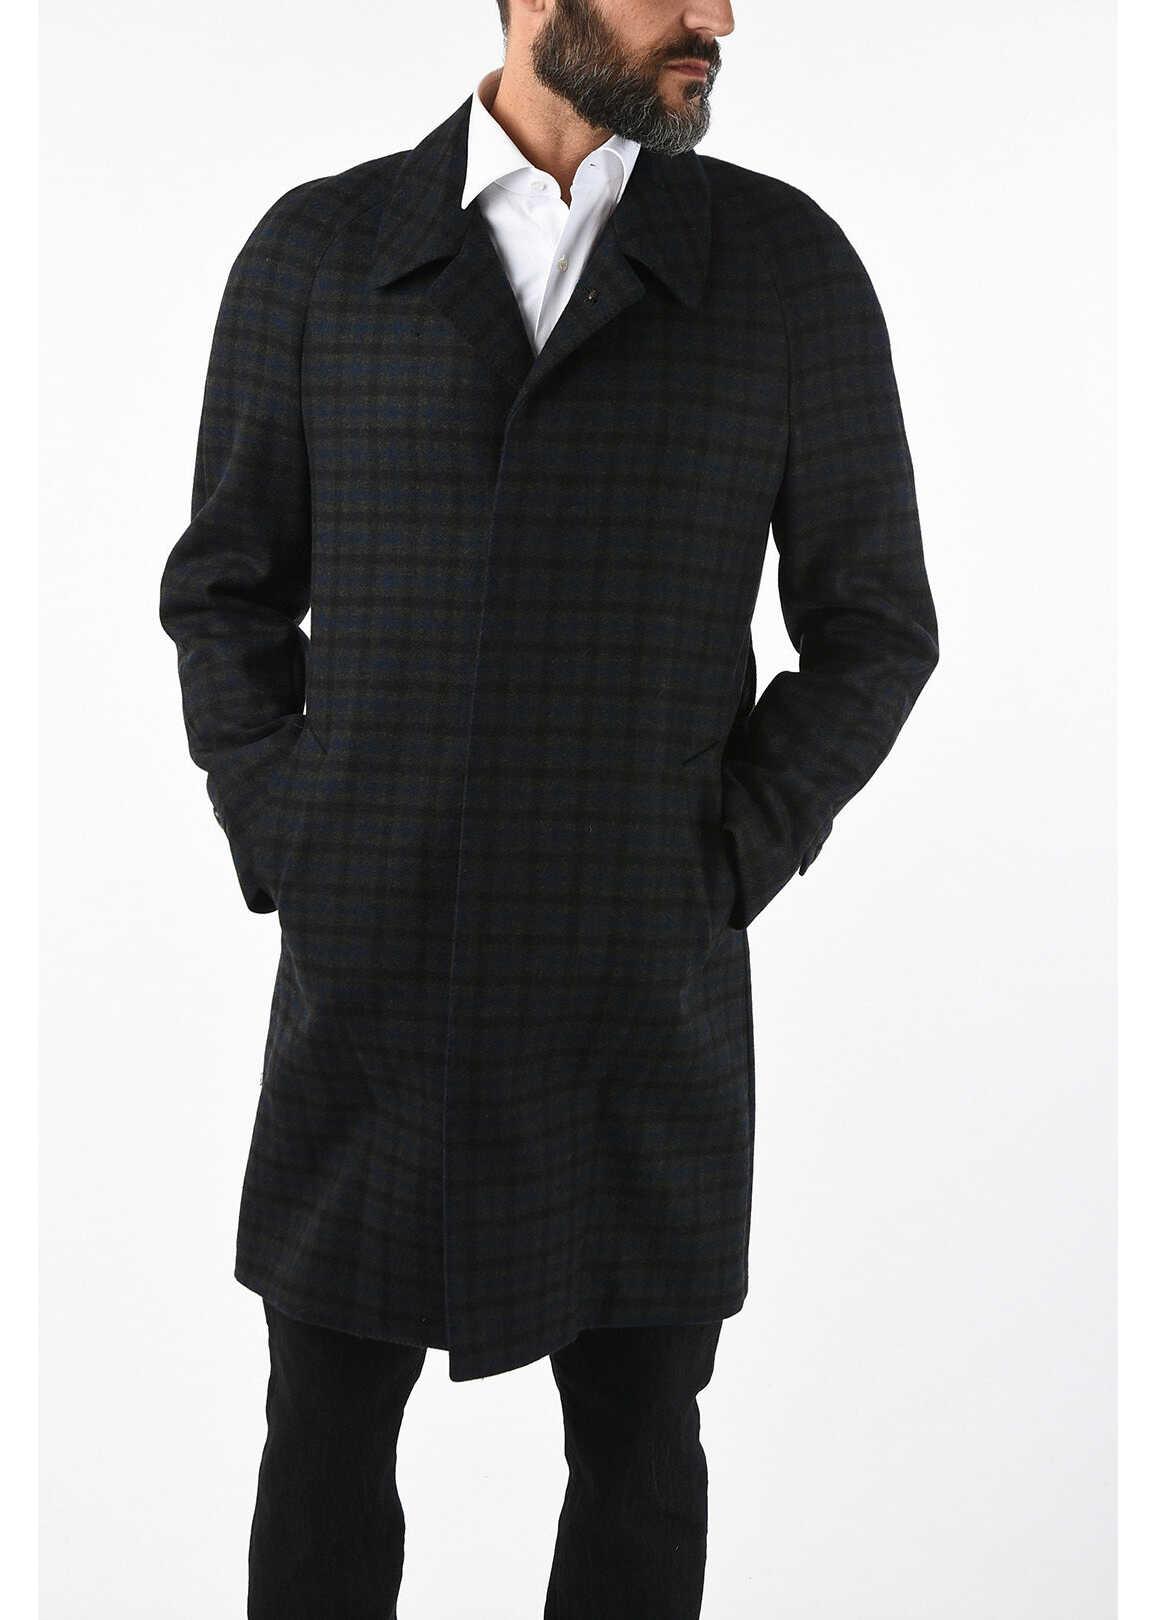 CORNELIANI CC COLLECTION pin check virgin wool coat MULTICOLOR imagine